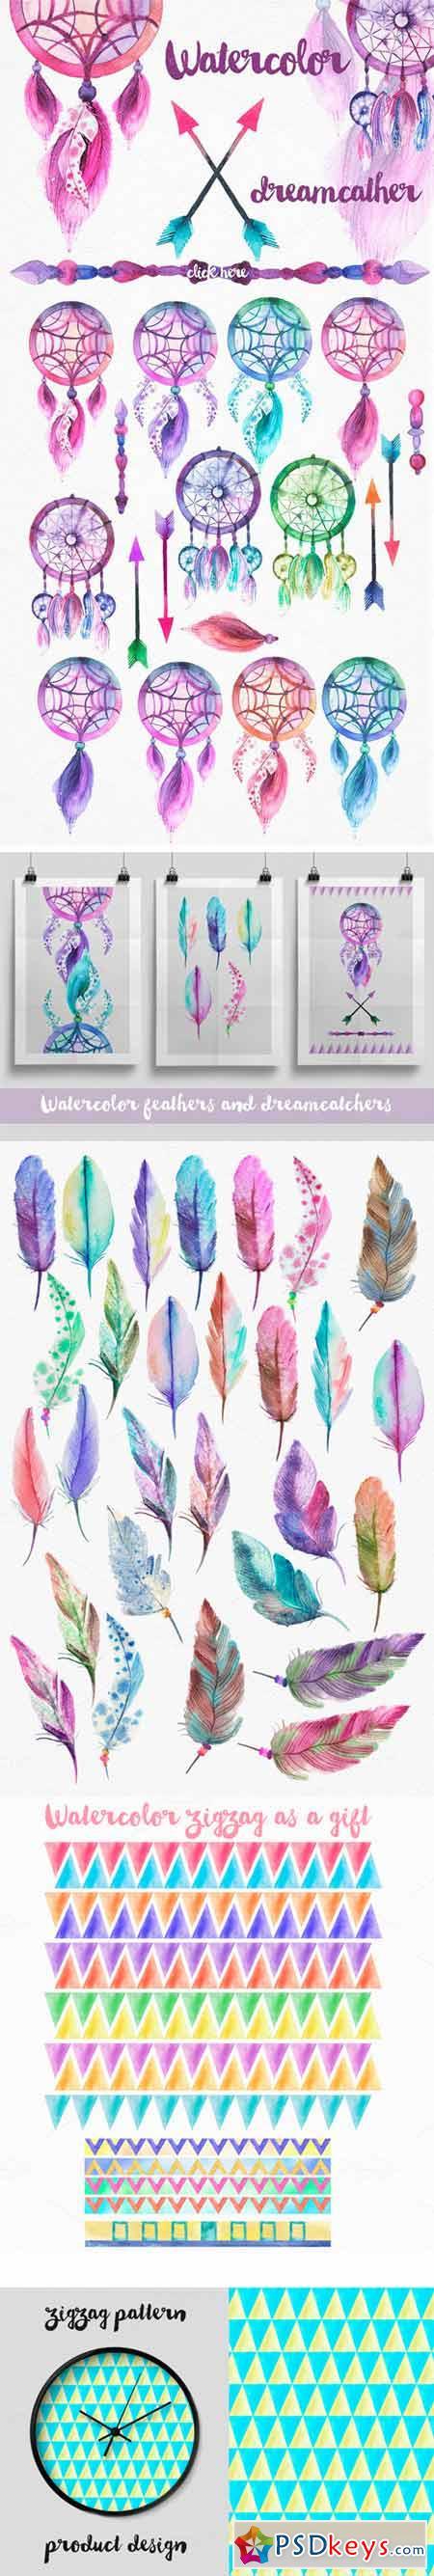 Watercolor Feathers & Dreamcatchers 295661